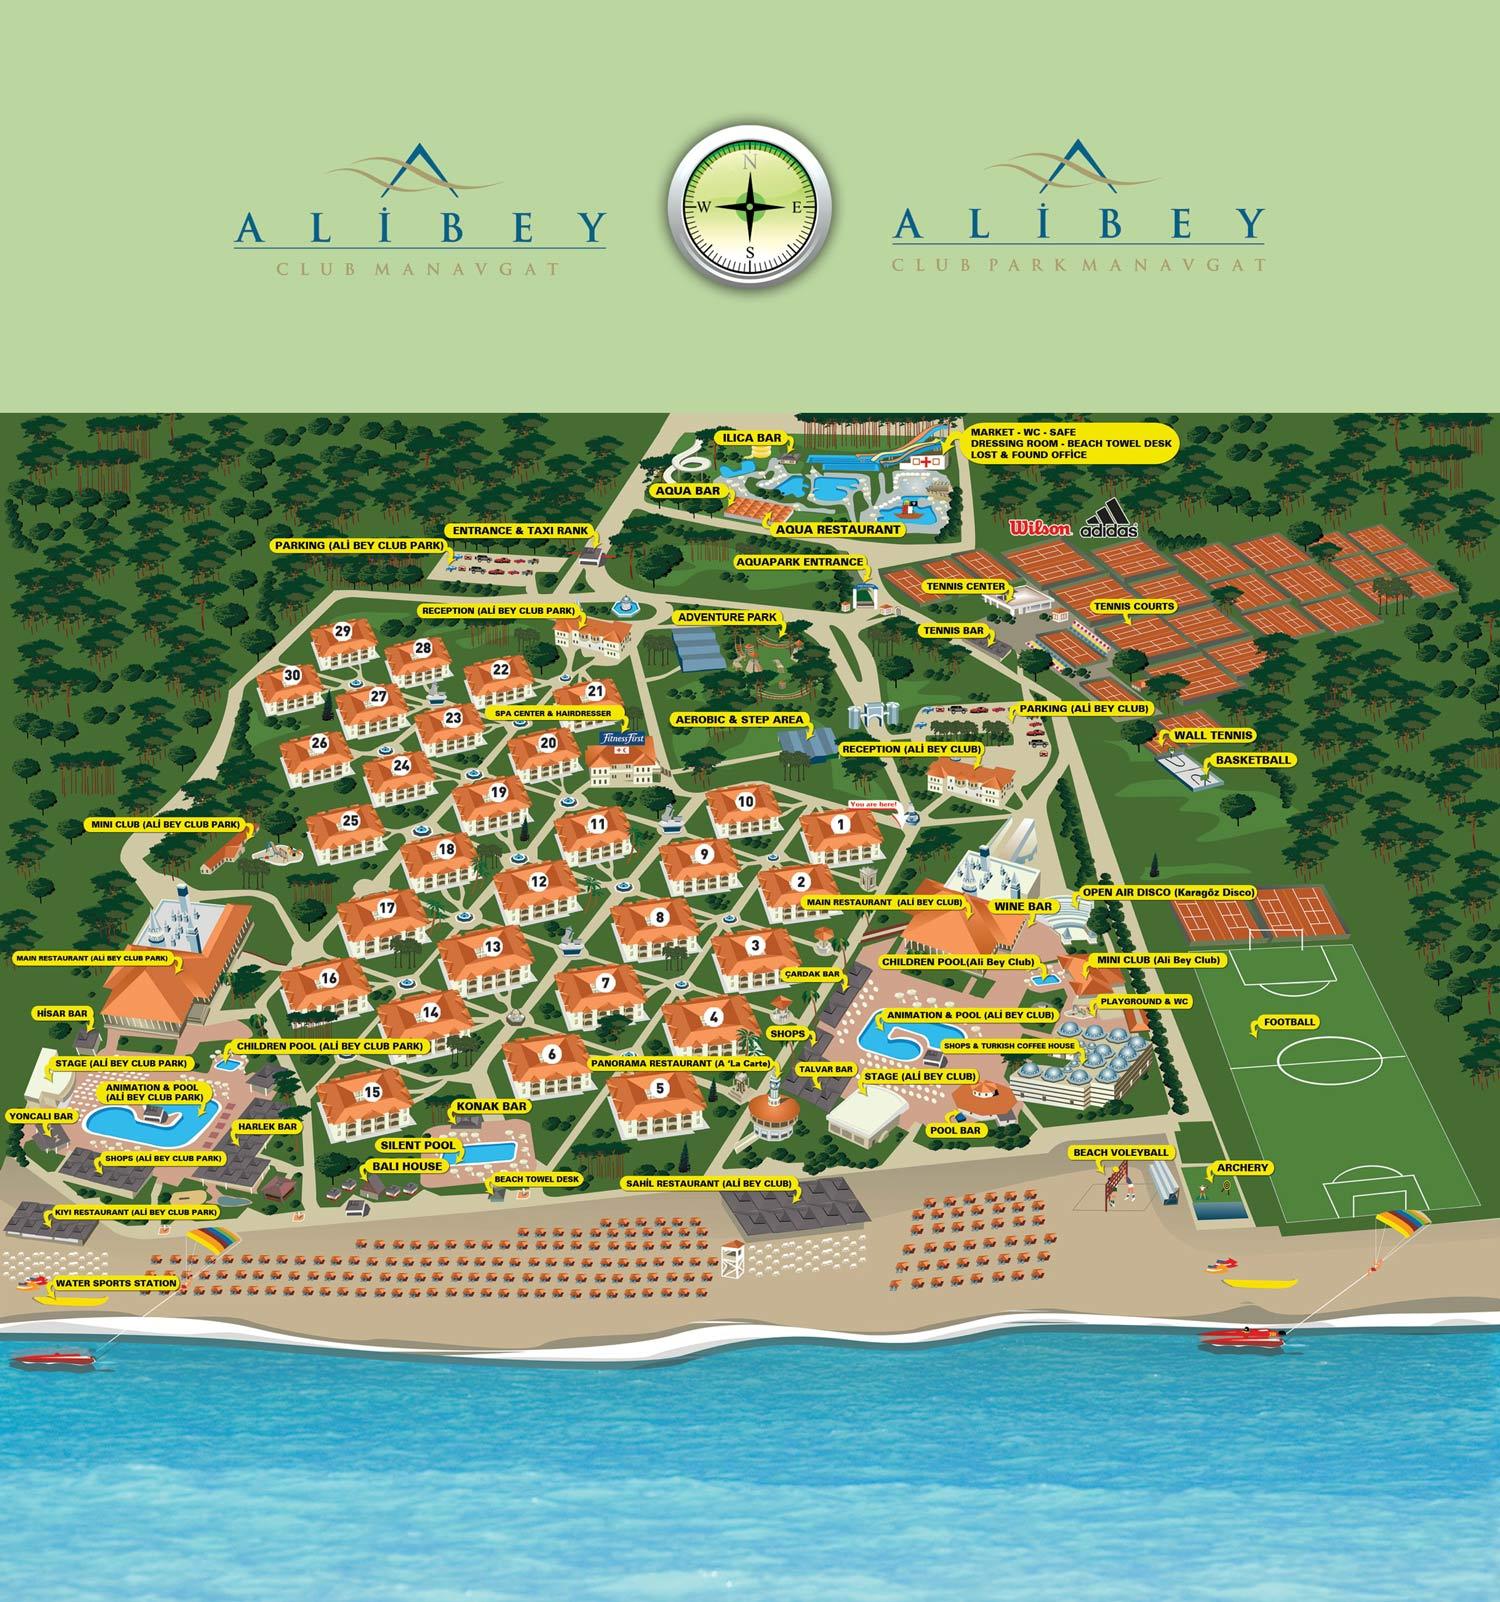 Отель Ali Bey Club Park Manavgat HV1 5* (Али Бей Клуб Парк ...: http://tourmania.com.ua/hotels/turkey-hotels/side-hotels/4272-ali-bey-club-park-manavgat-hv1-5-hotel-turciya-kizilagac.html